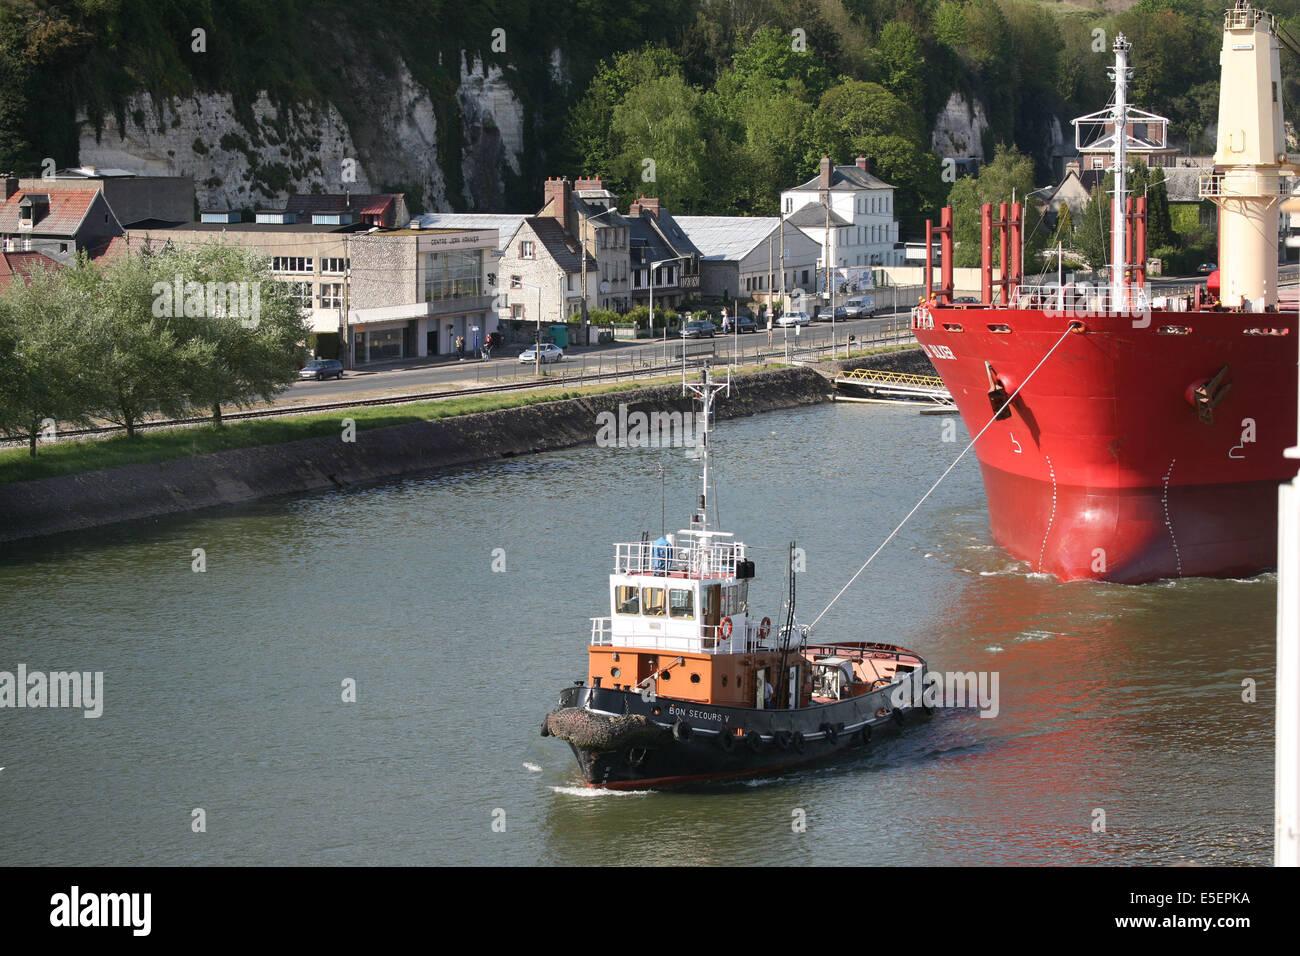 Sea port operations stock photos sea port operations stock images alamy - Grand port maritime de rouen ...